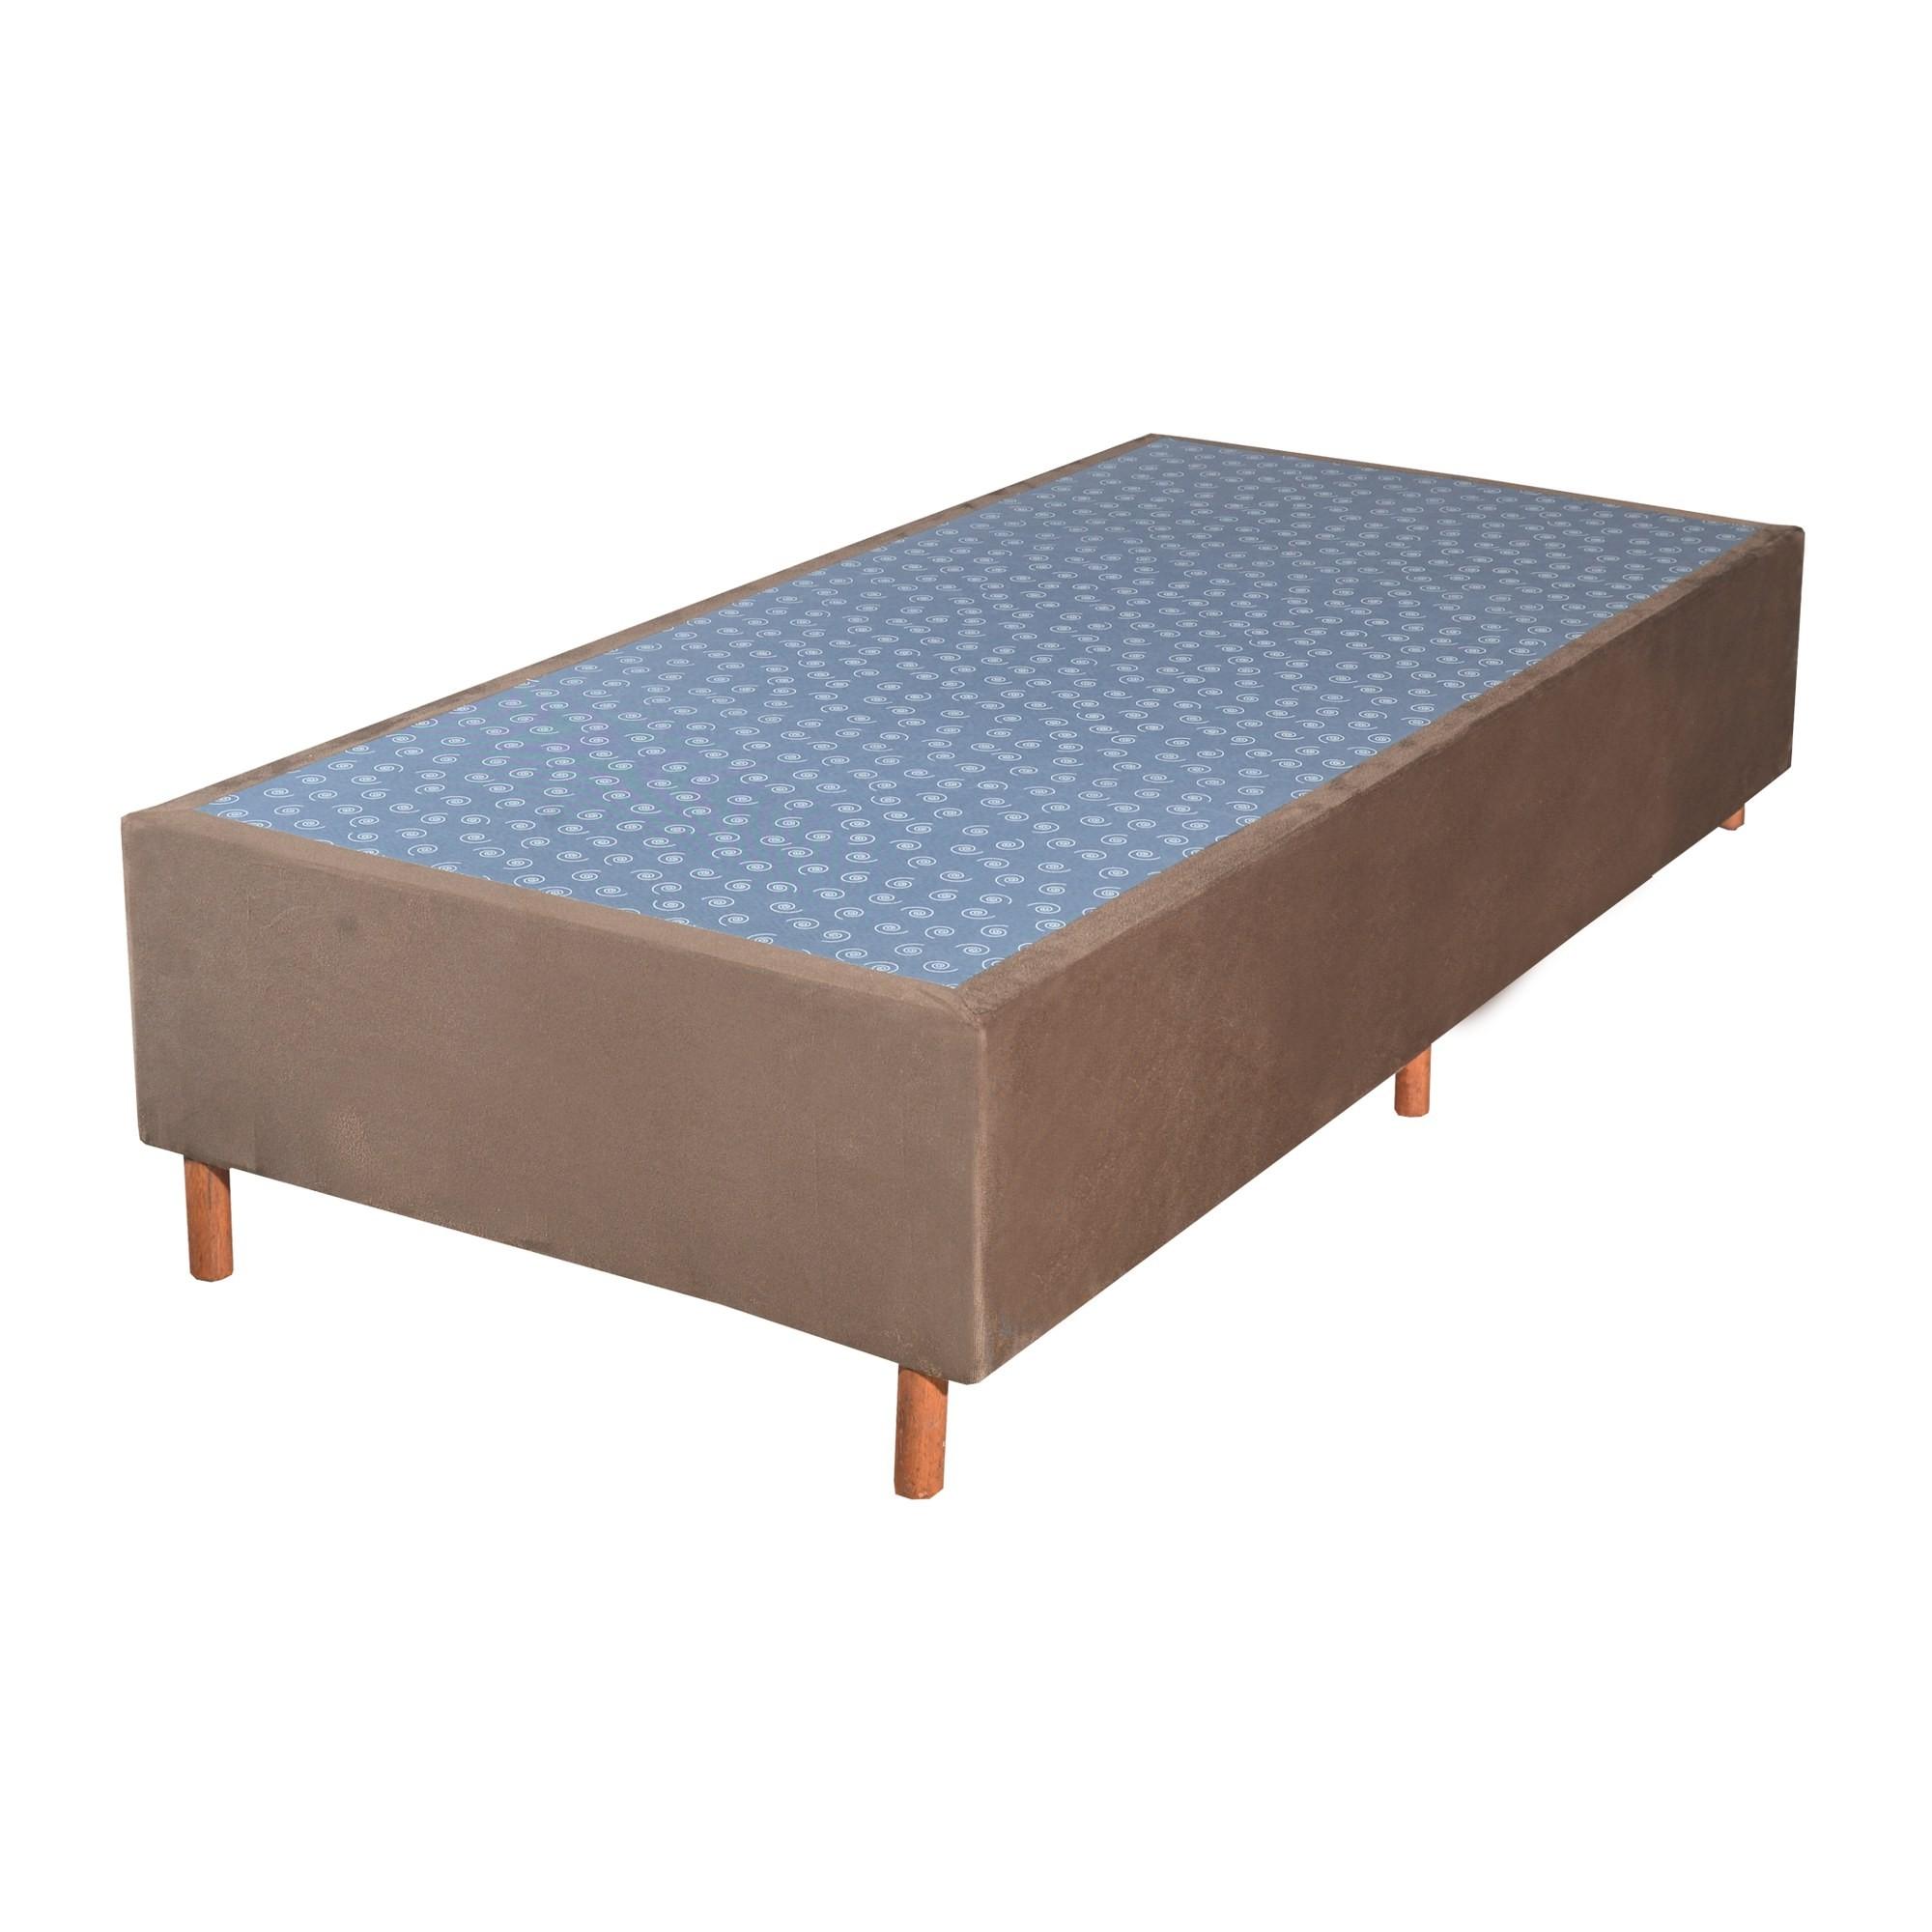 Cama Box Base Solteiro Veludo Marron 088x188x30